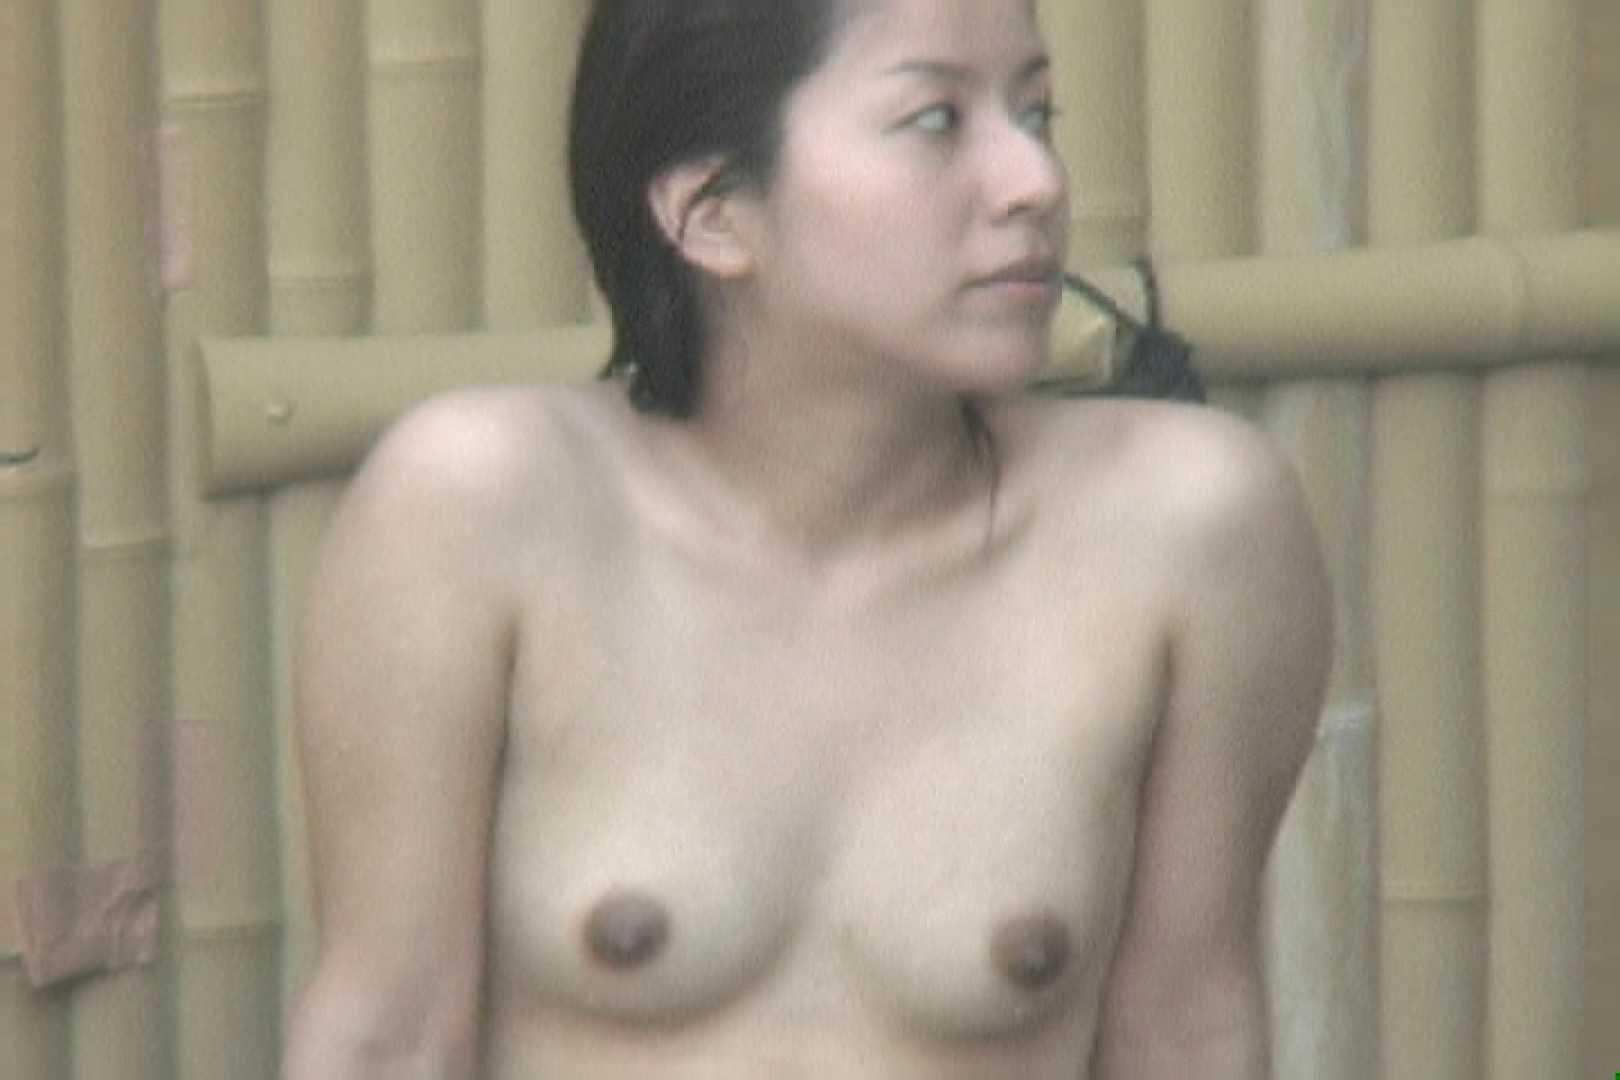 Aquaな露天風呂Vol.694 盗撮 | OLエロ画像  110PICs 73